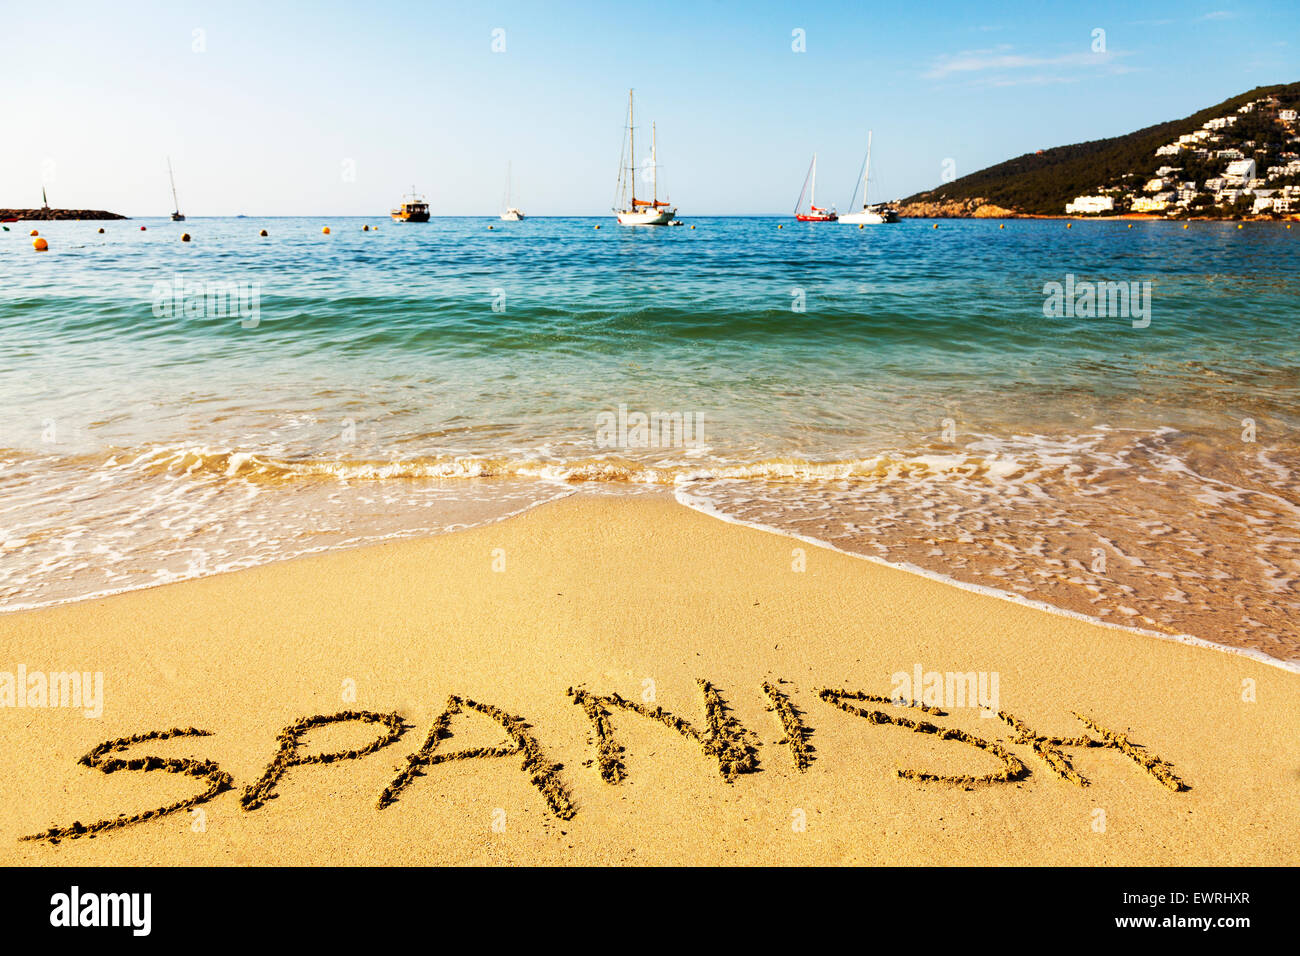 Spanish word in sand written on beach coast coastline holiday getaway sea Ibiza Spain Santa Eula - Stock Image